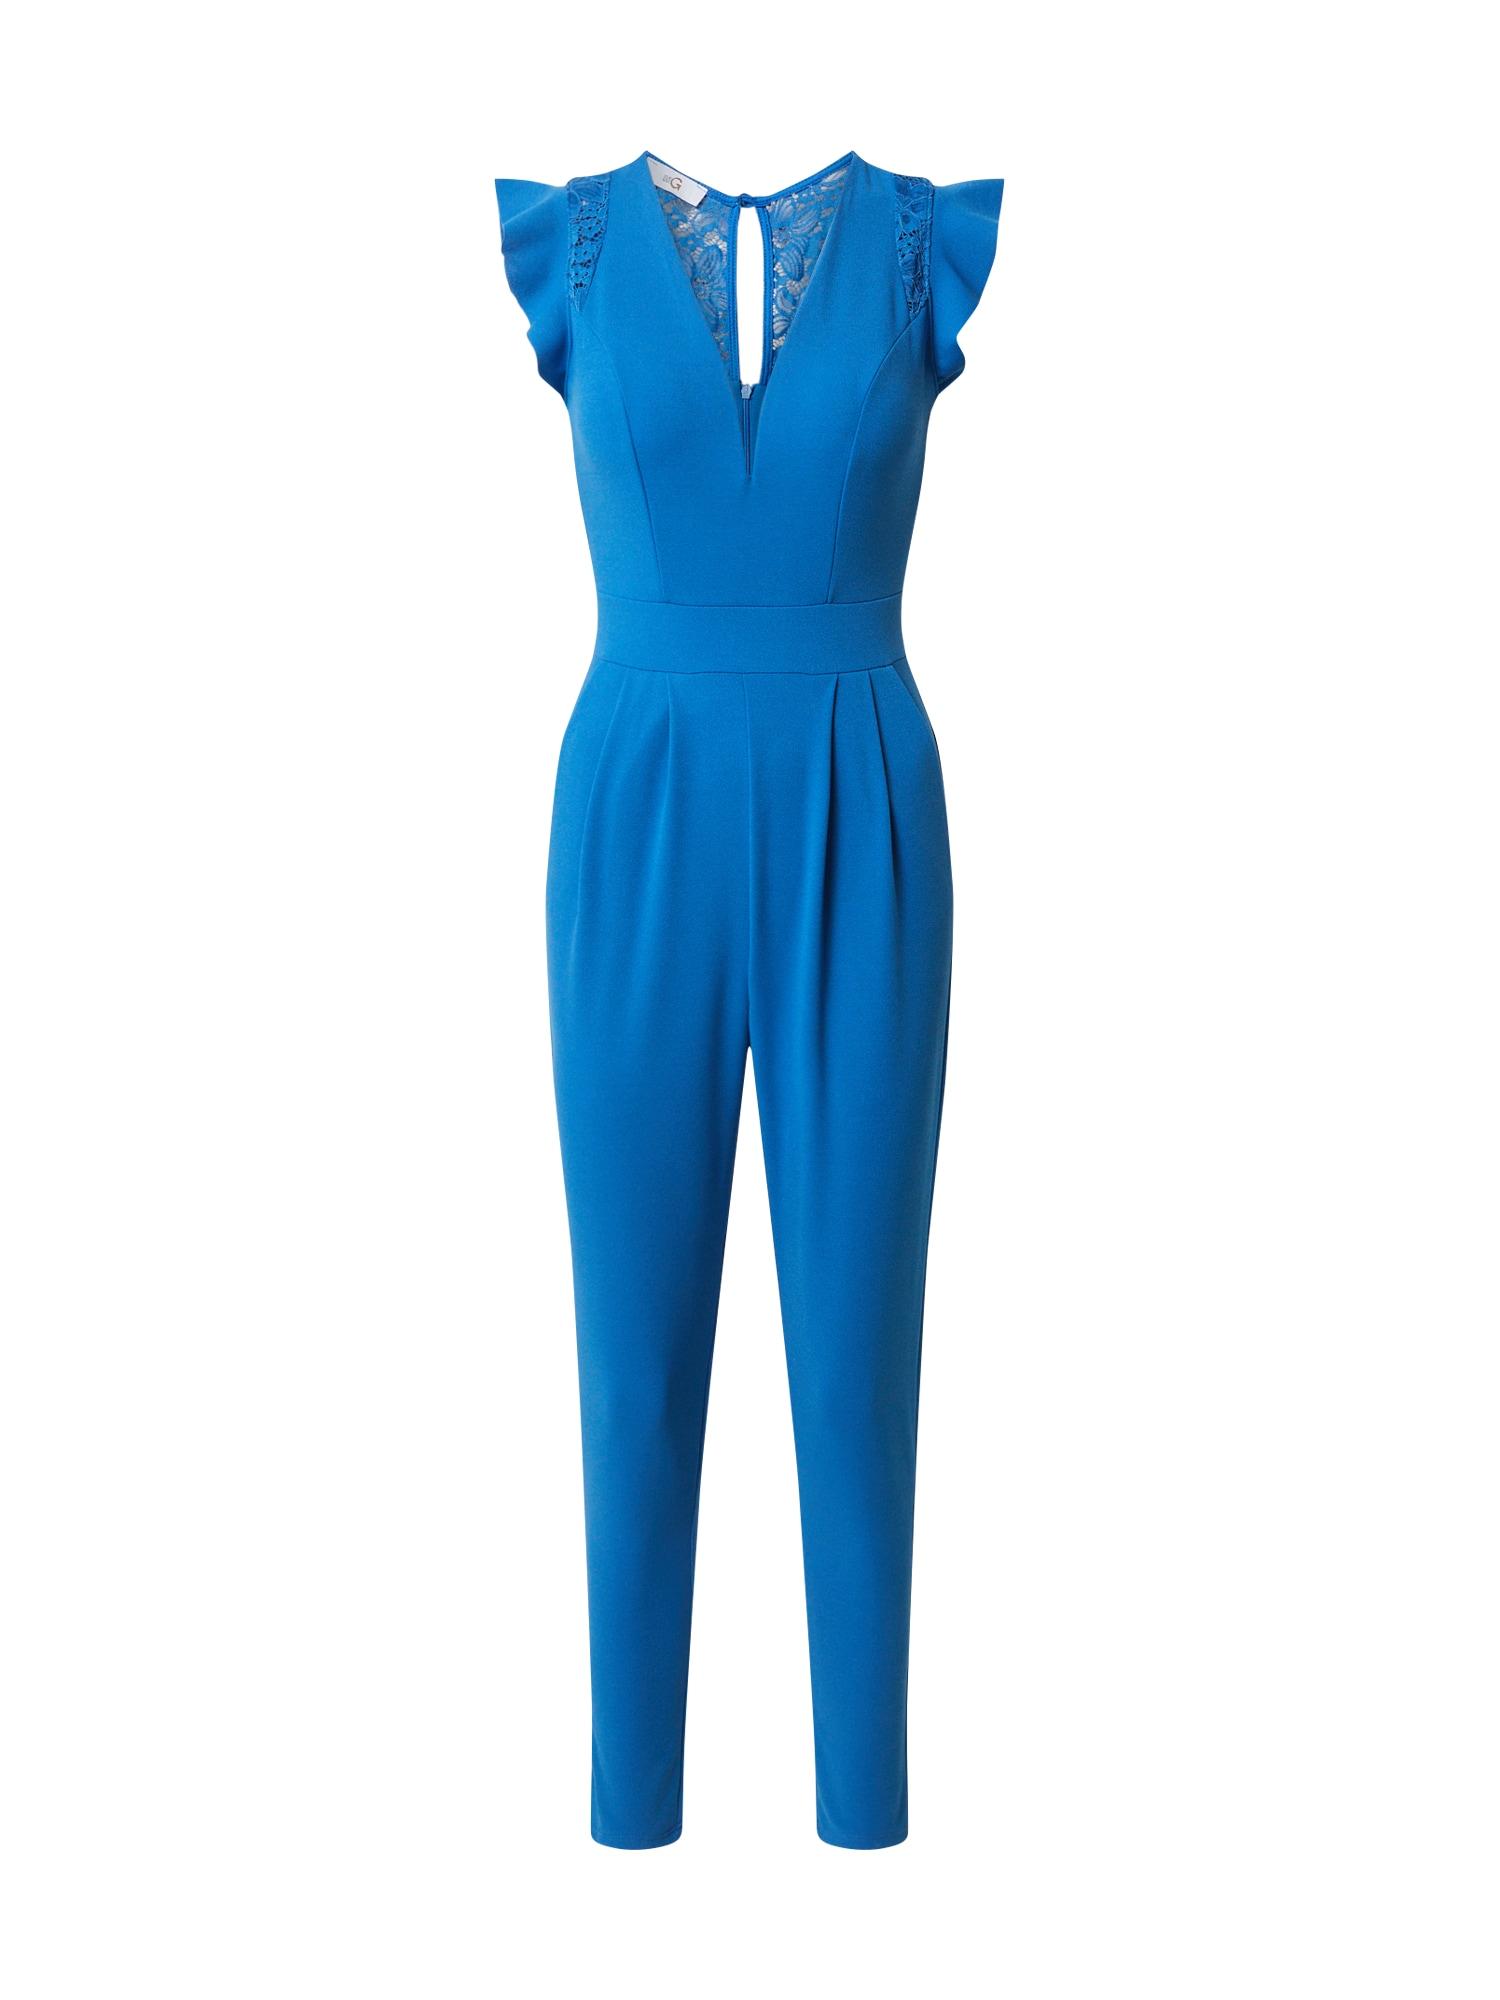 WAL G. Vienos dalies kostiumas mėlyna